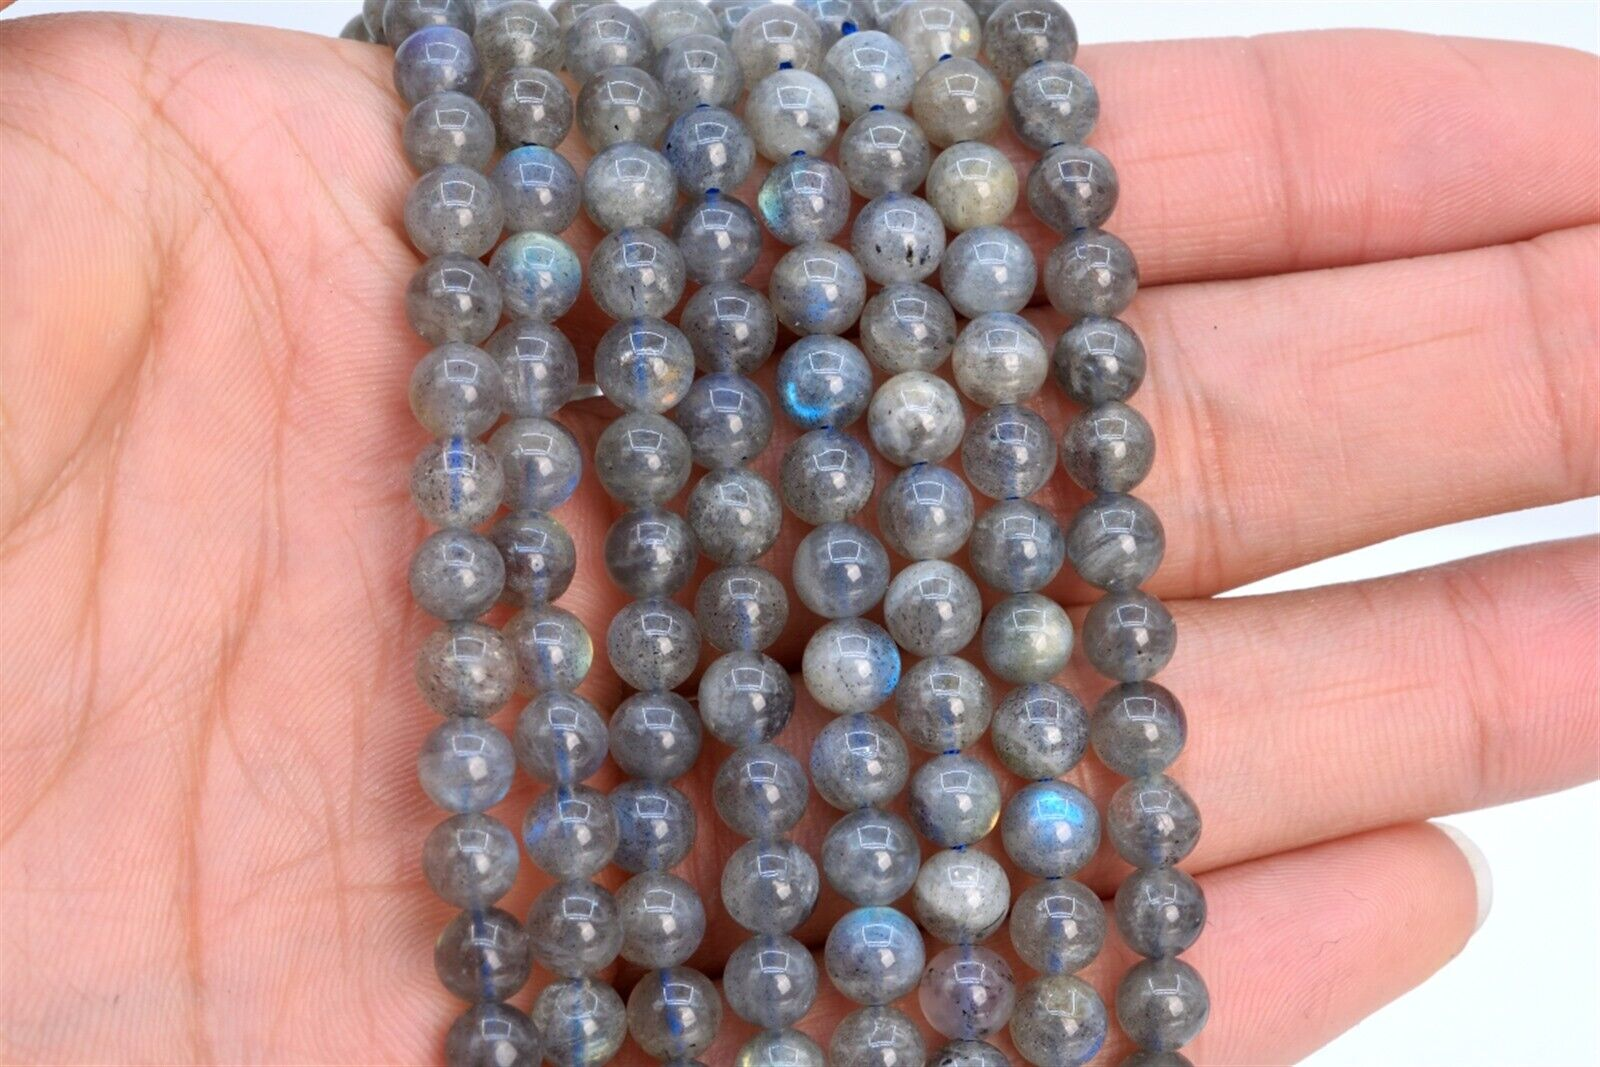 115546-3875 5-6MM Transparent Gray Labradorite Beads Madagascar Grade AAA Genuine Natural Gemstone Full Strand Round Loose Beads 15